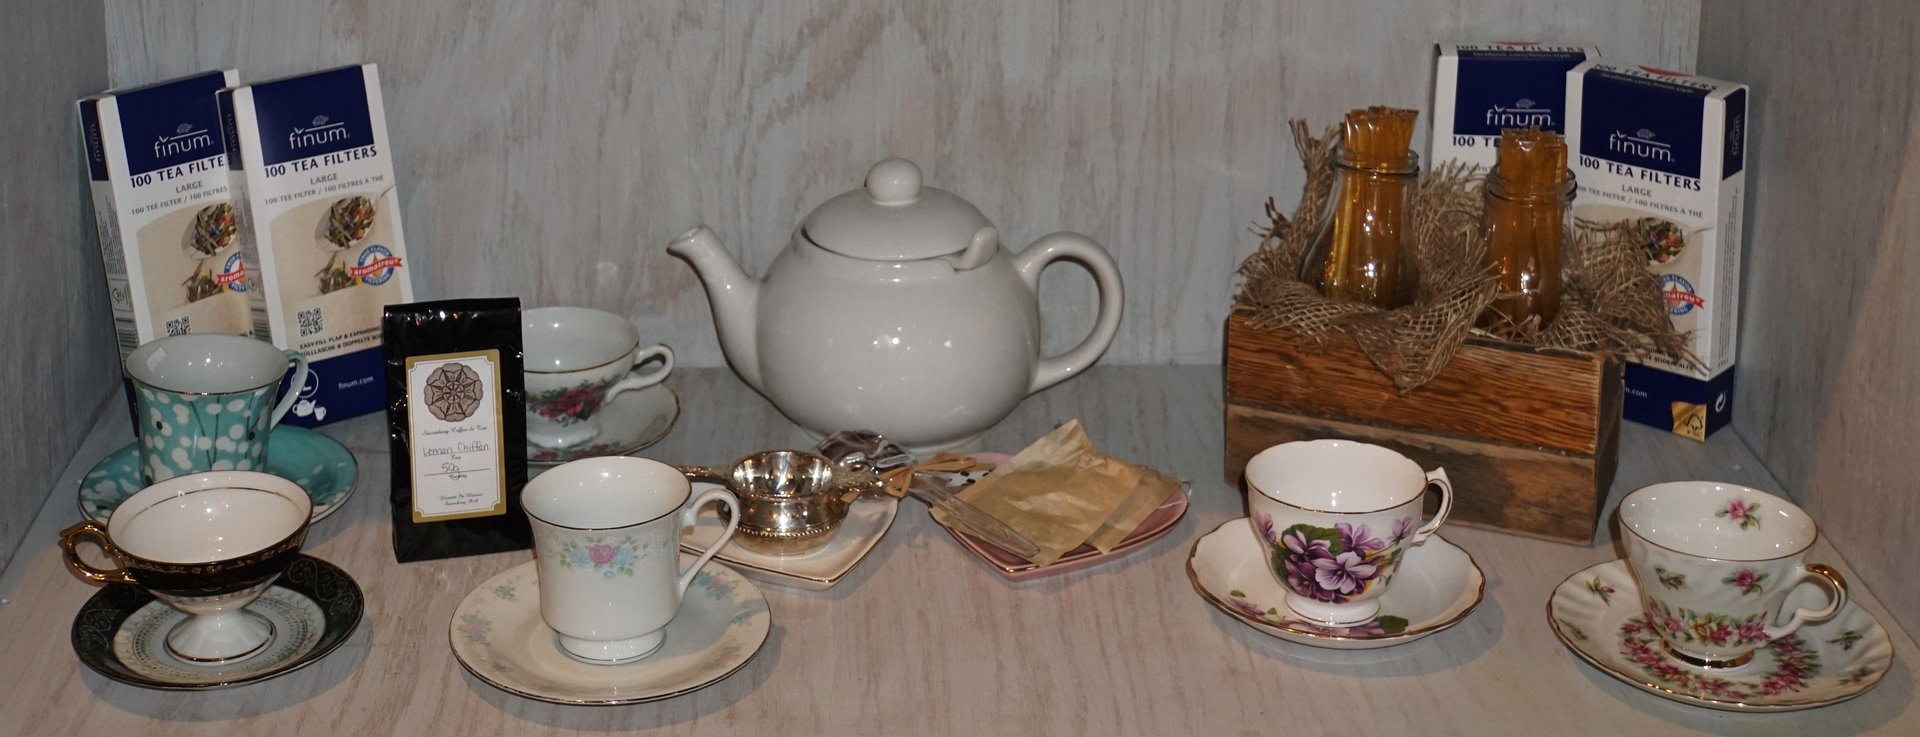 Saxonburg Coffee & Tea image 1